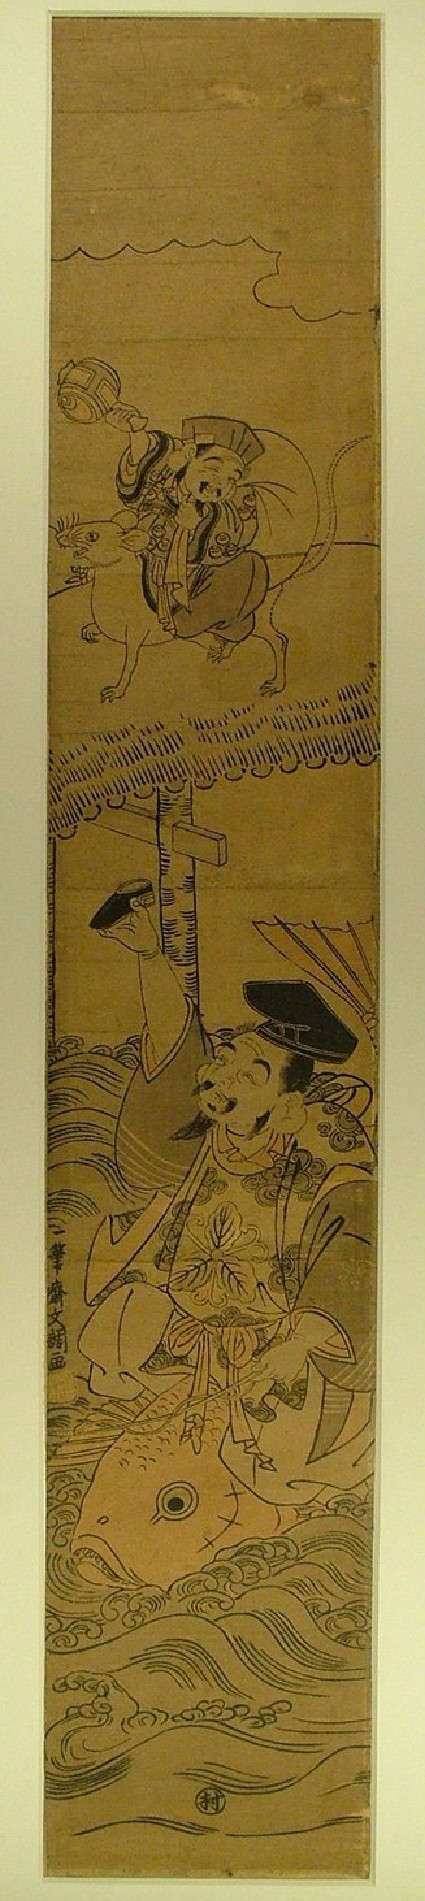 Parody of the tale of Chōryo and Kōsekikō